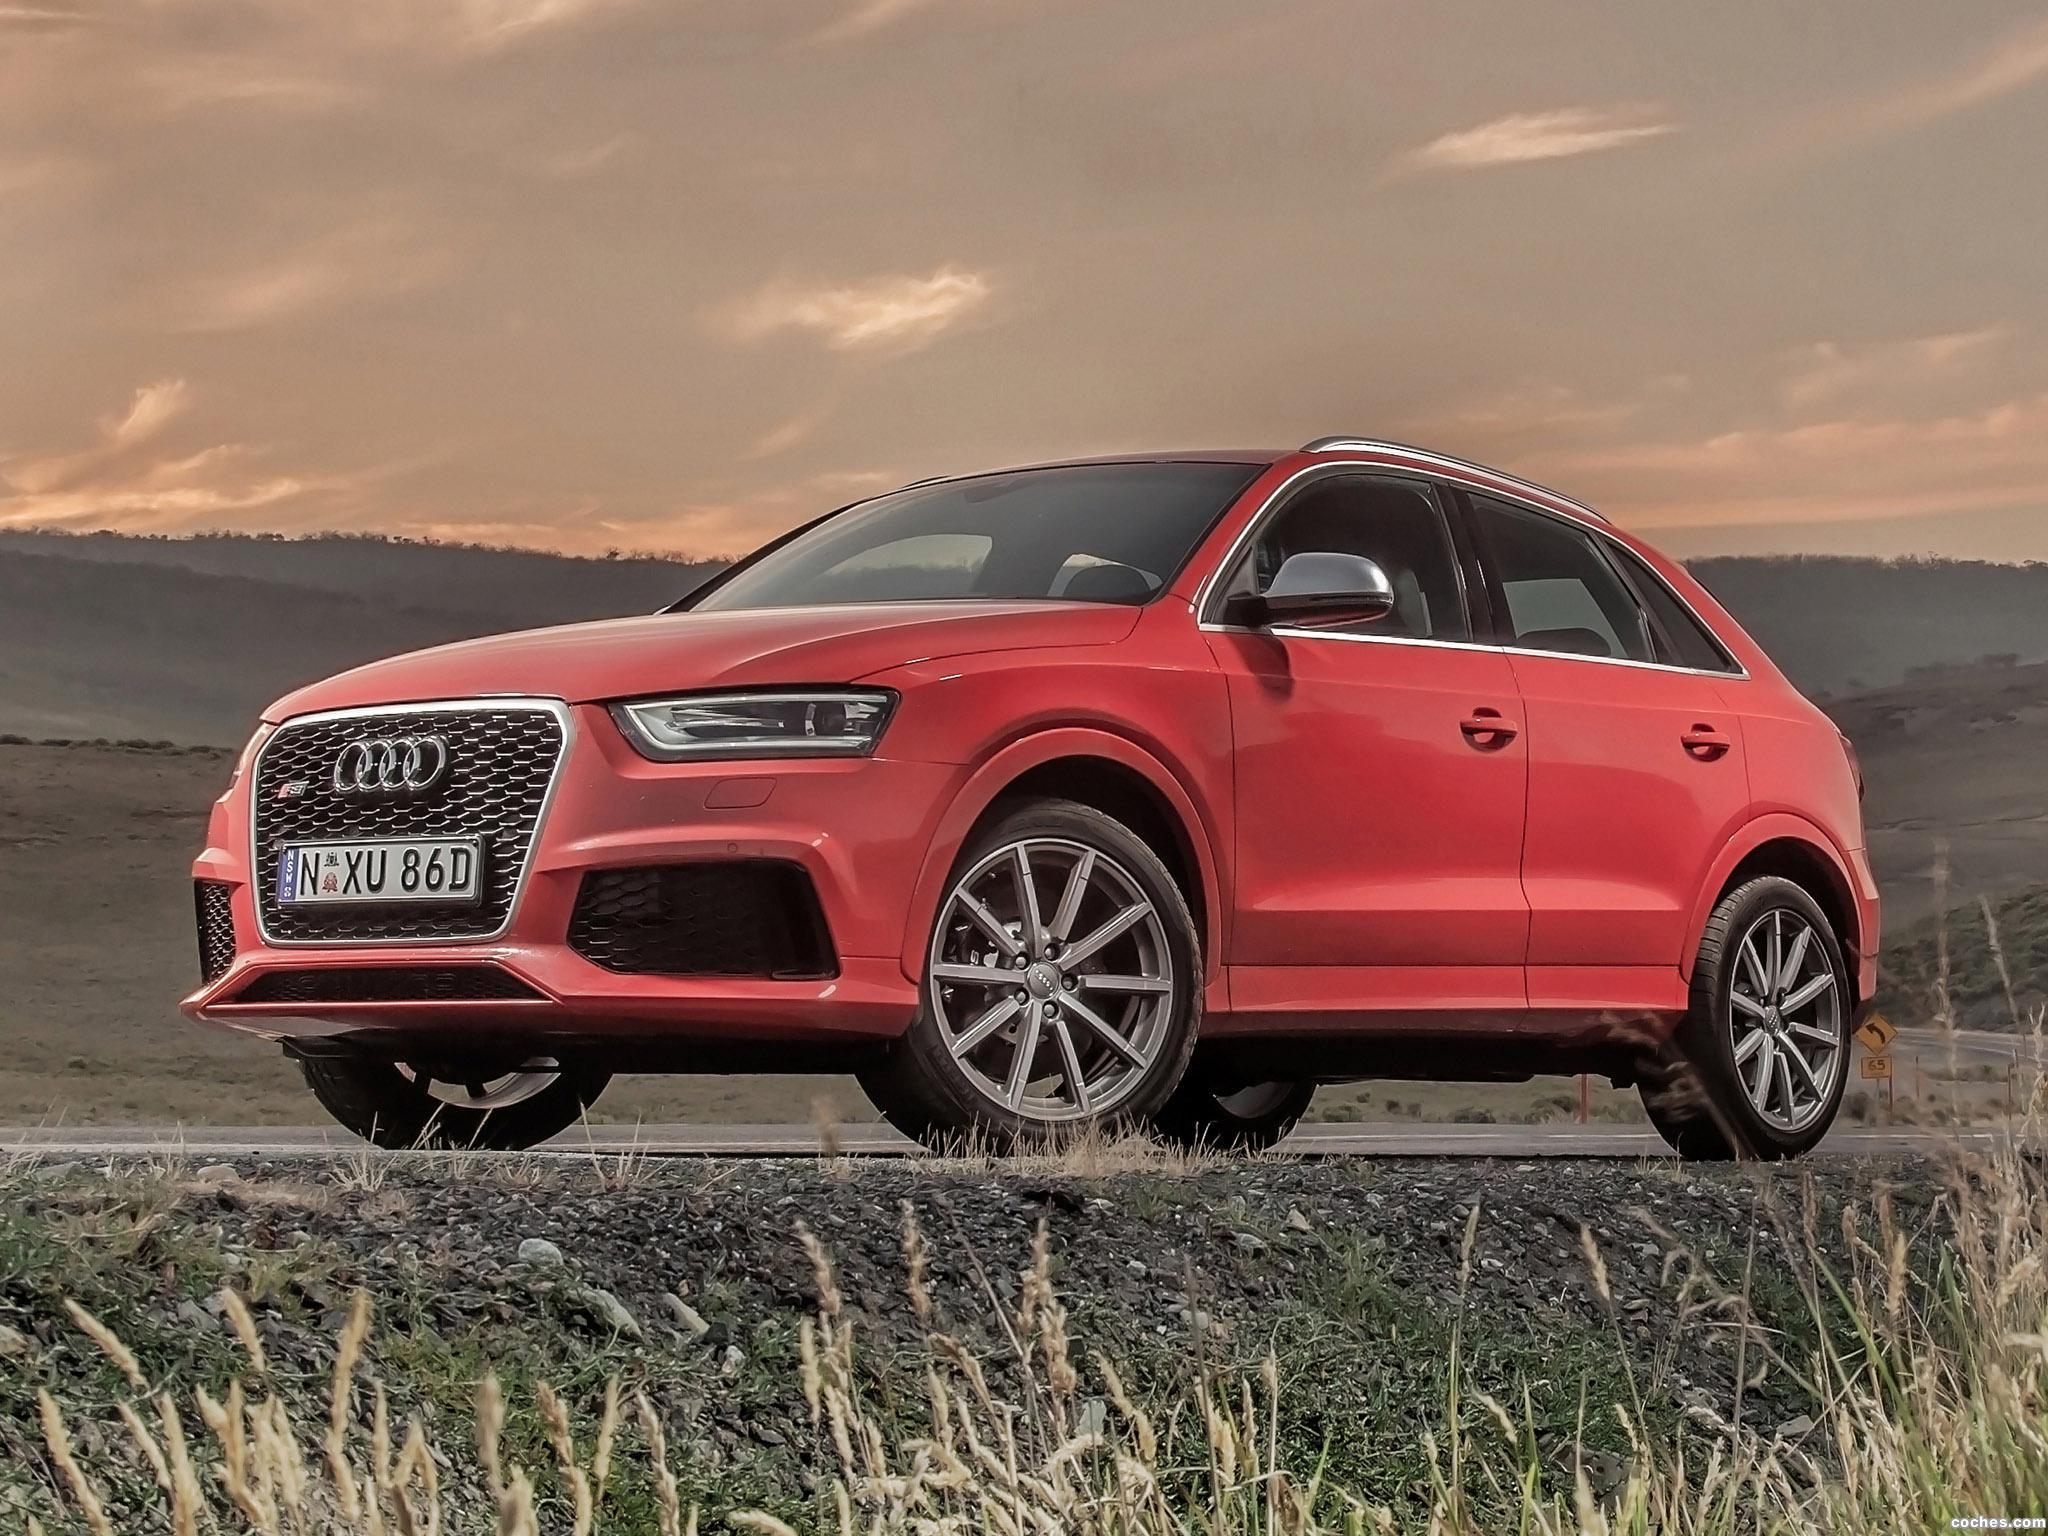 Foto 0 de Audi audi RS Q3 Australia 2014